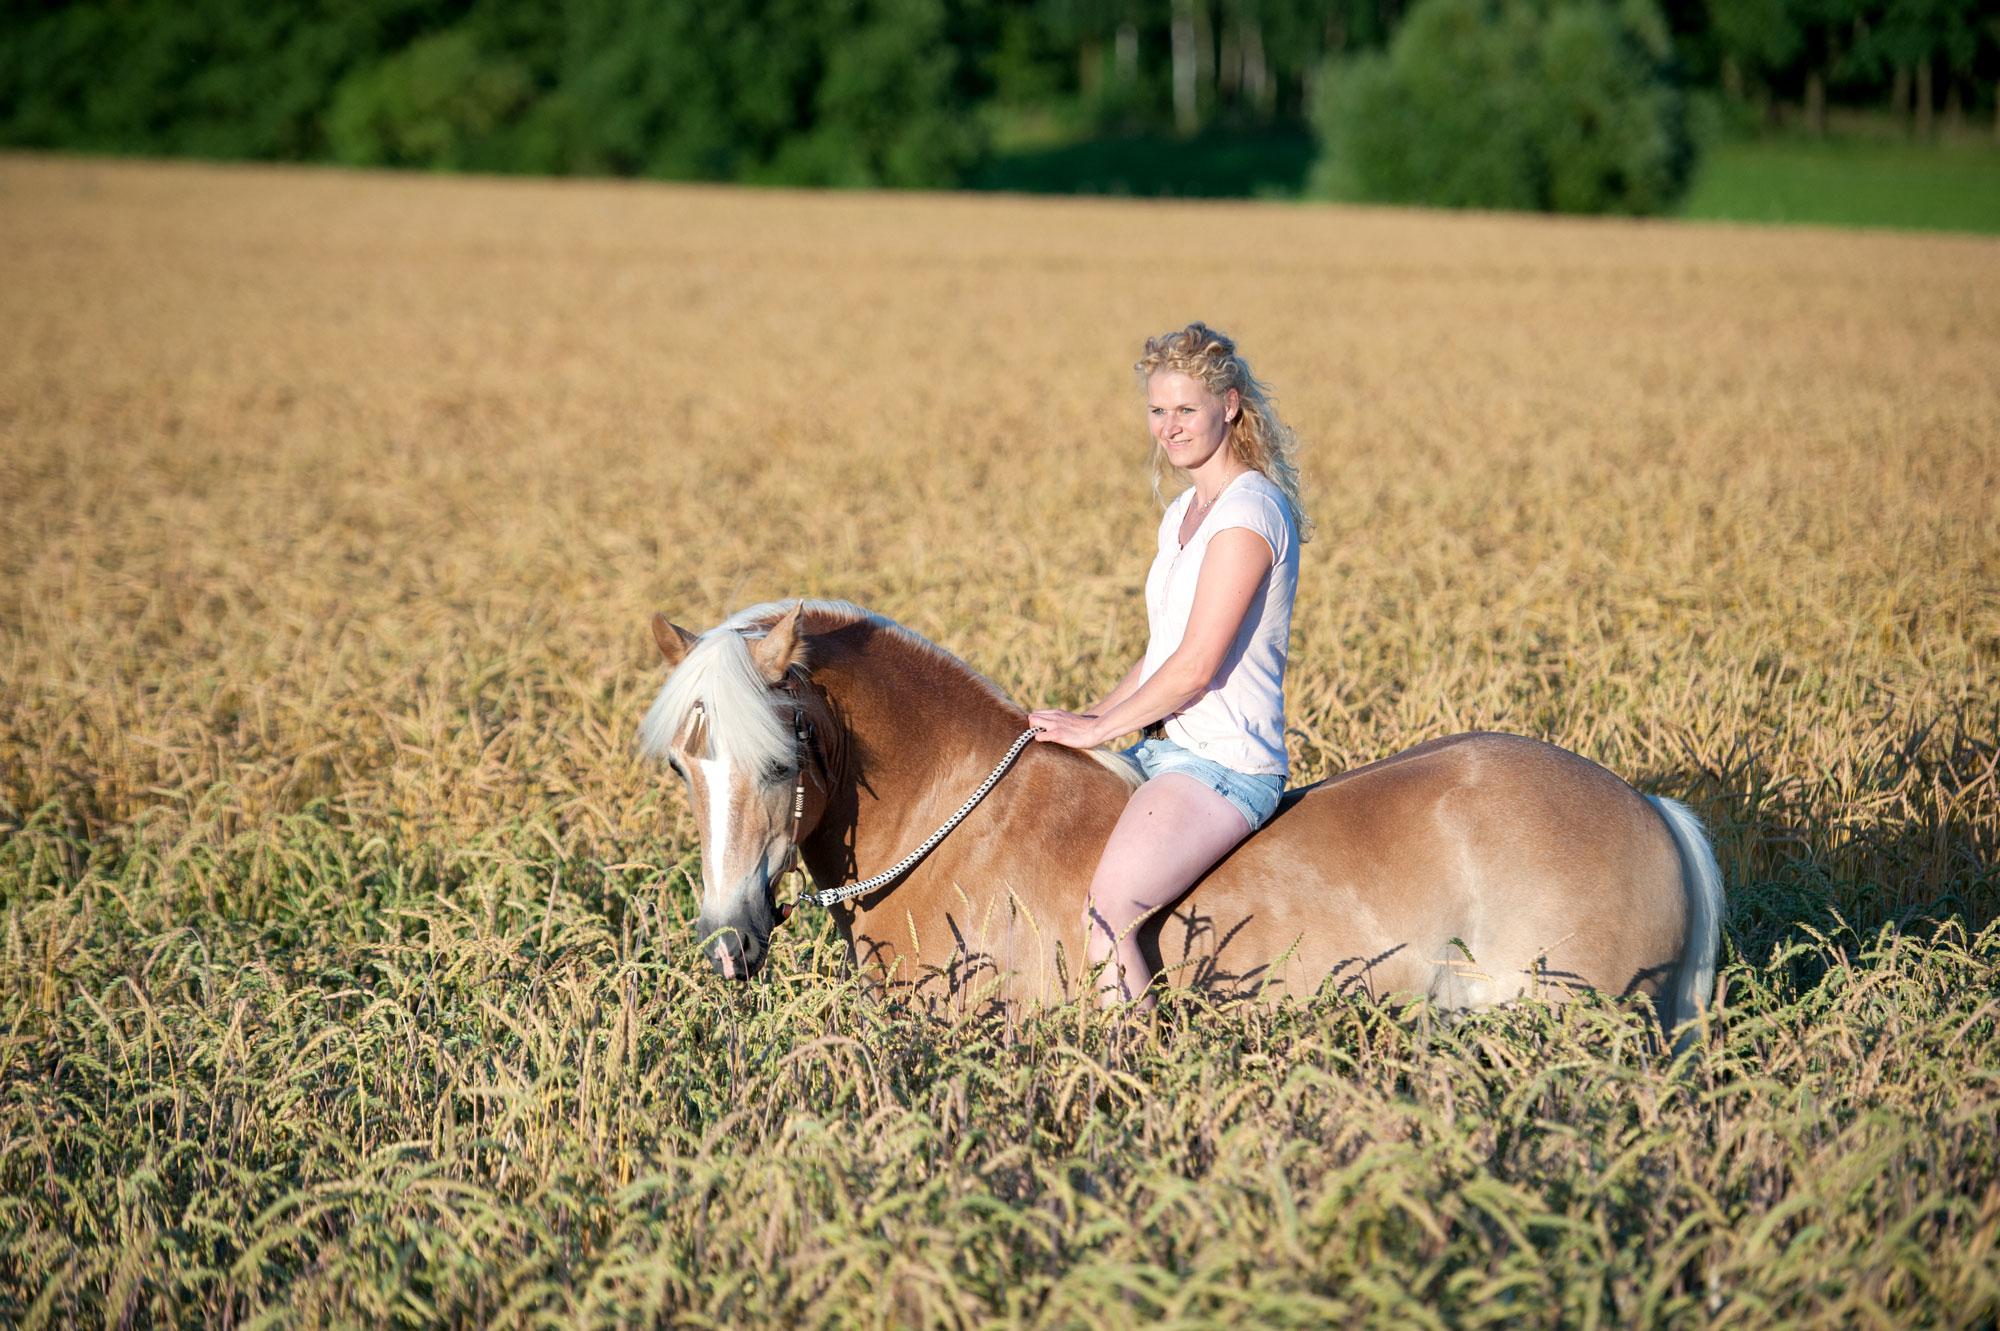 Claudia_Oppel_Pferdetraining_Trainerin